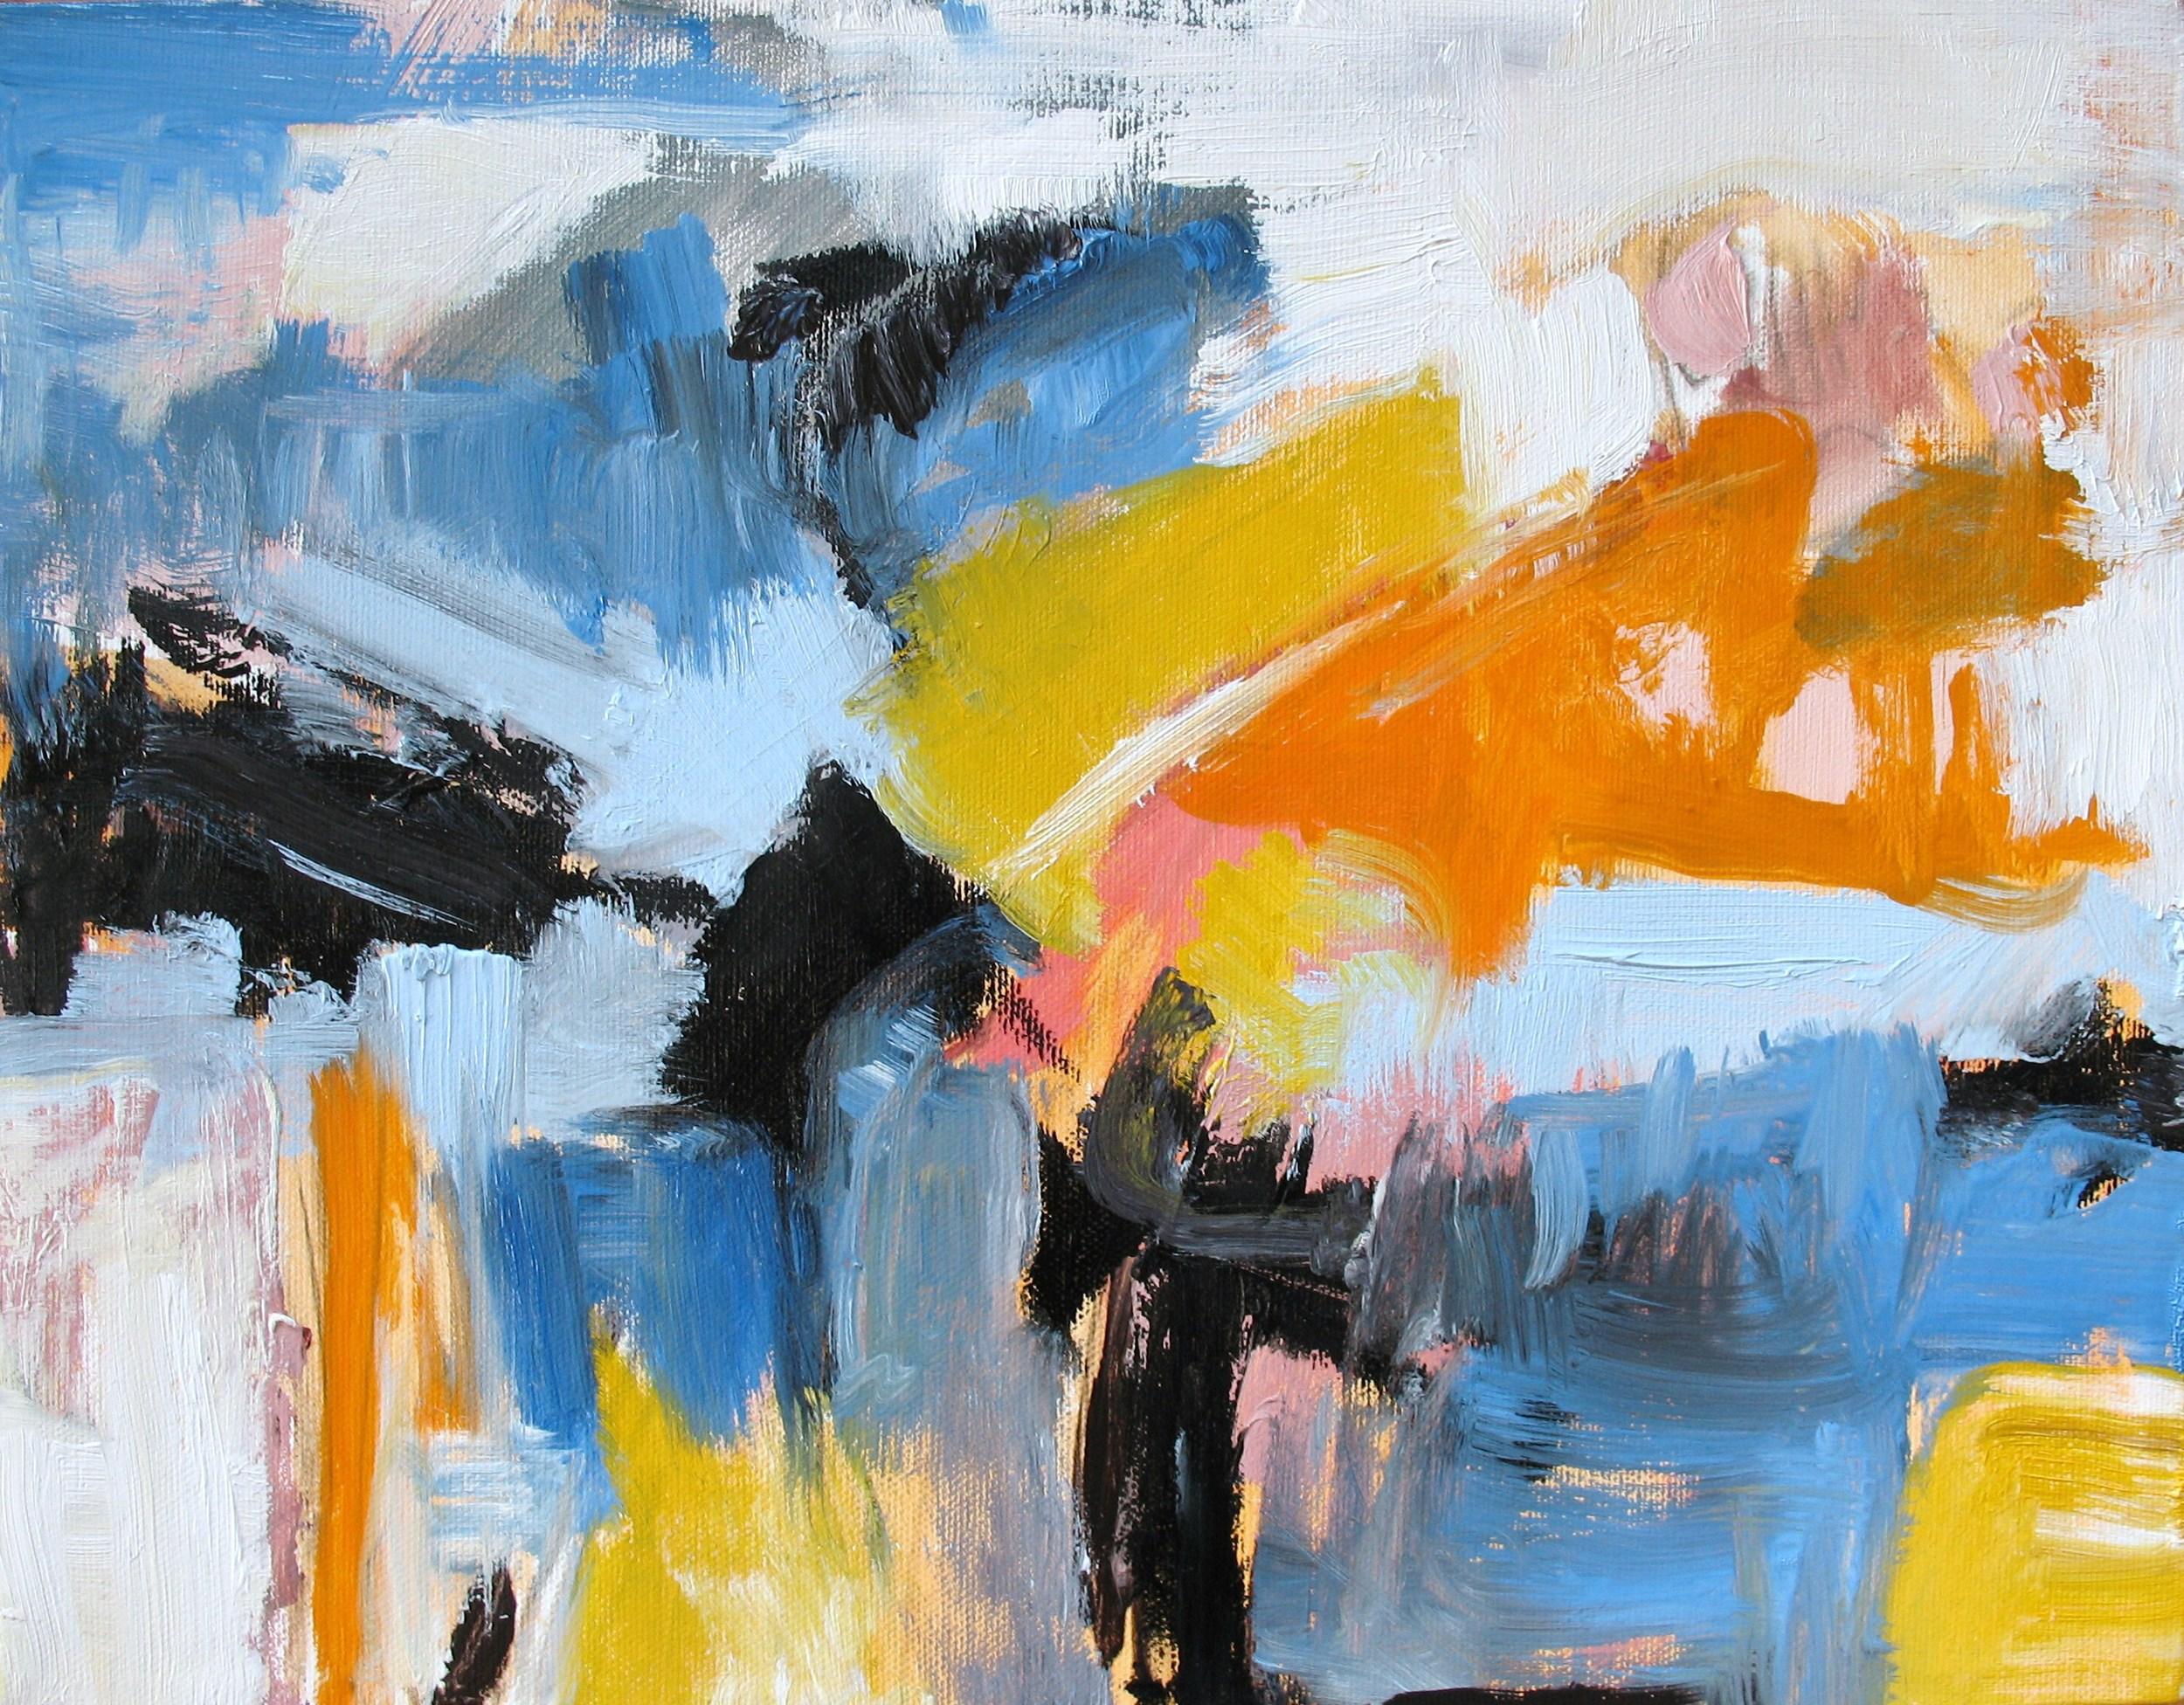 Bridge, 2009/ Oil on canvas, 10 x 12